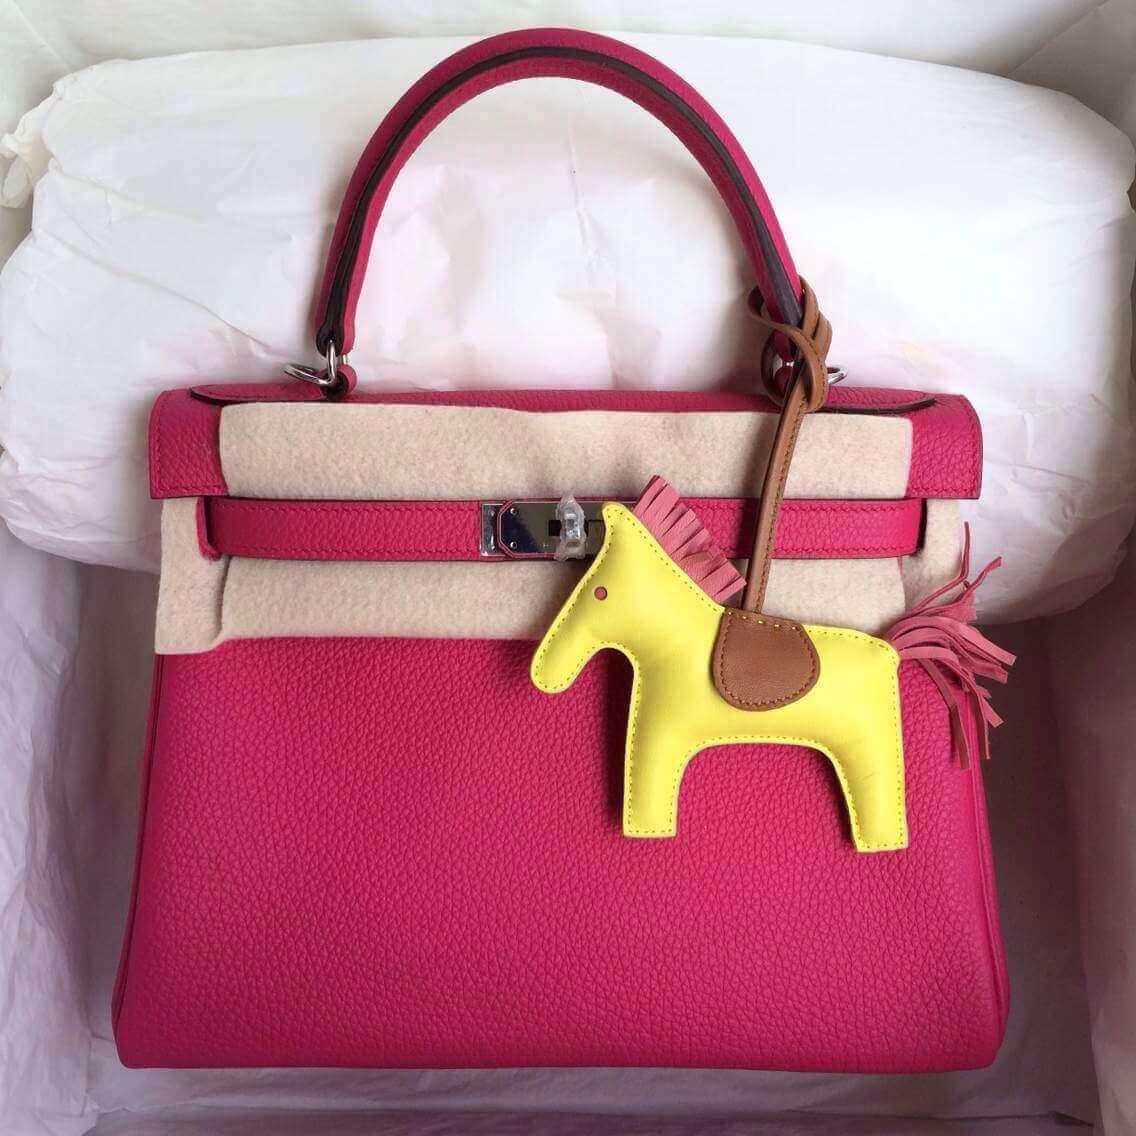 Konj na Kelly bag, podsetnik na praporeklo Hermès-ovih torbi